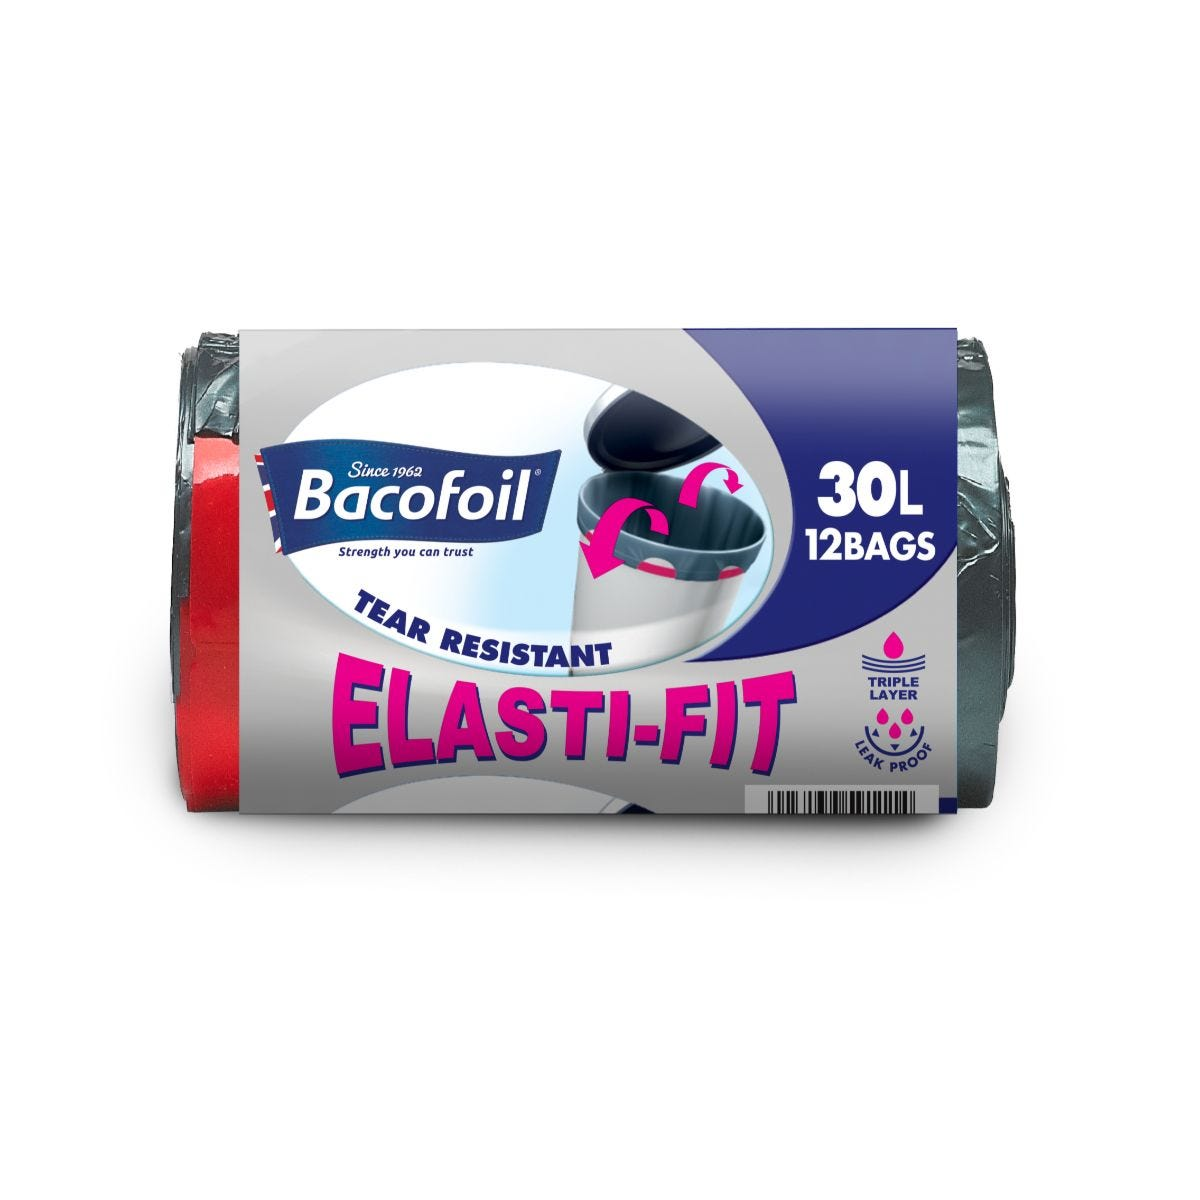 Bacofoil 30L Elasti-Fit Kitchen Bin Liners - Pack of 12